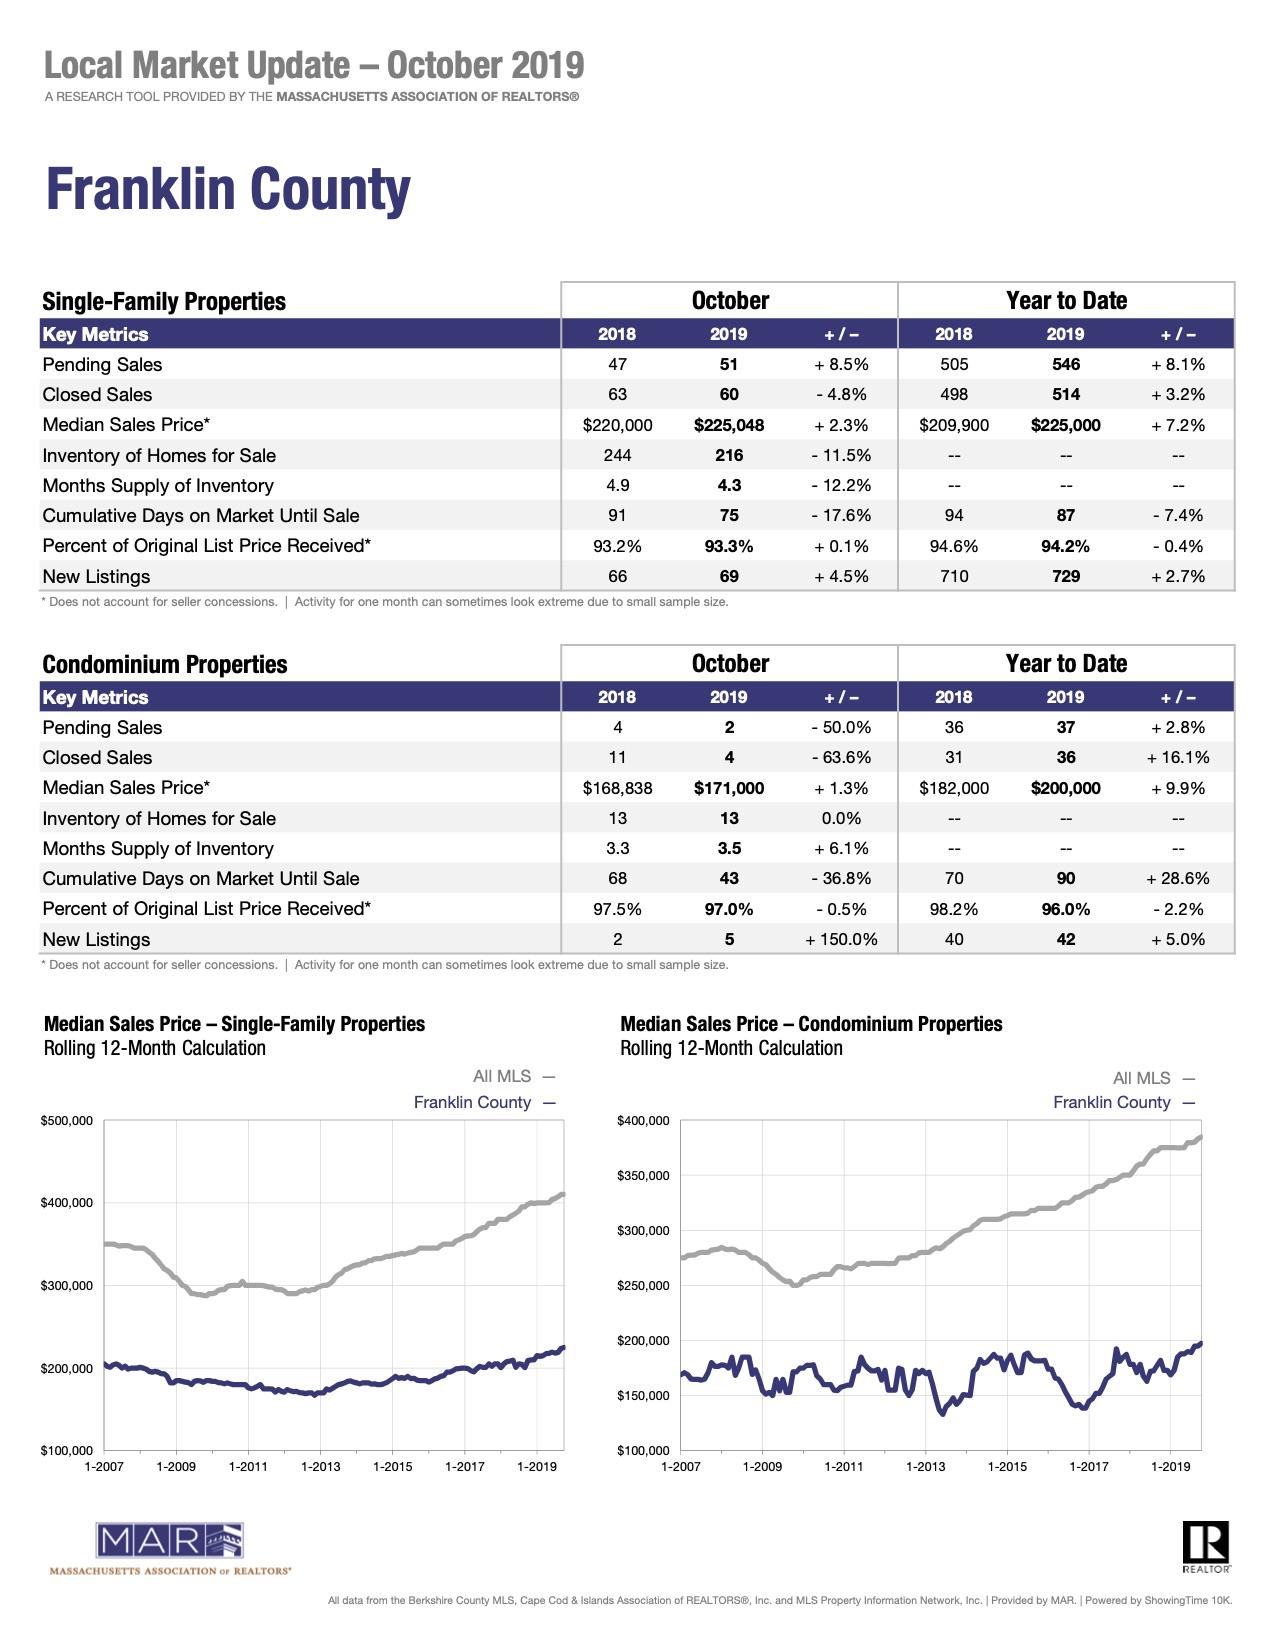 Franklin County Massachusetts Real Estate